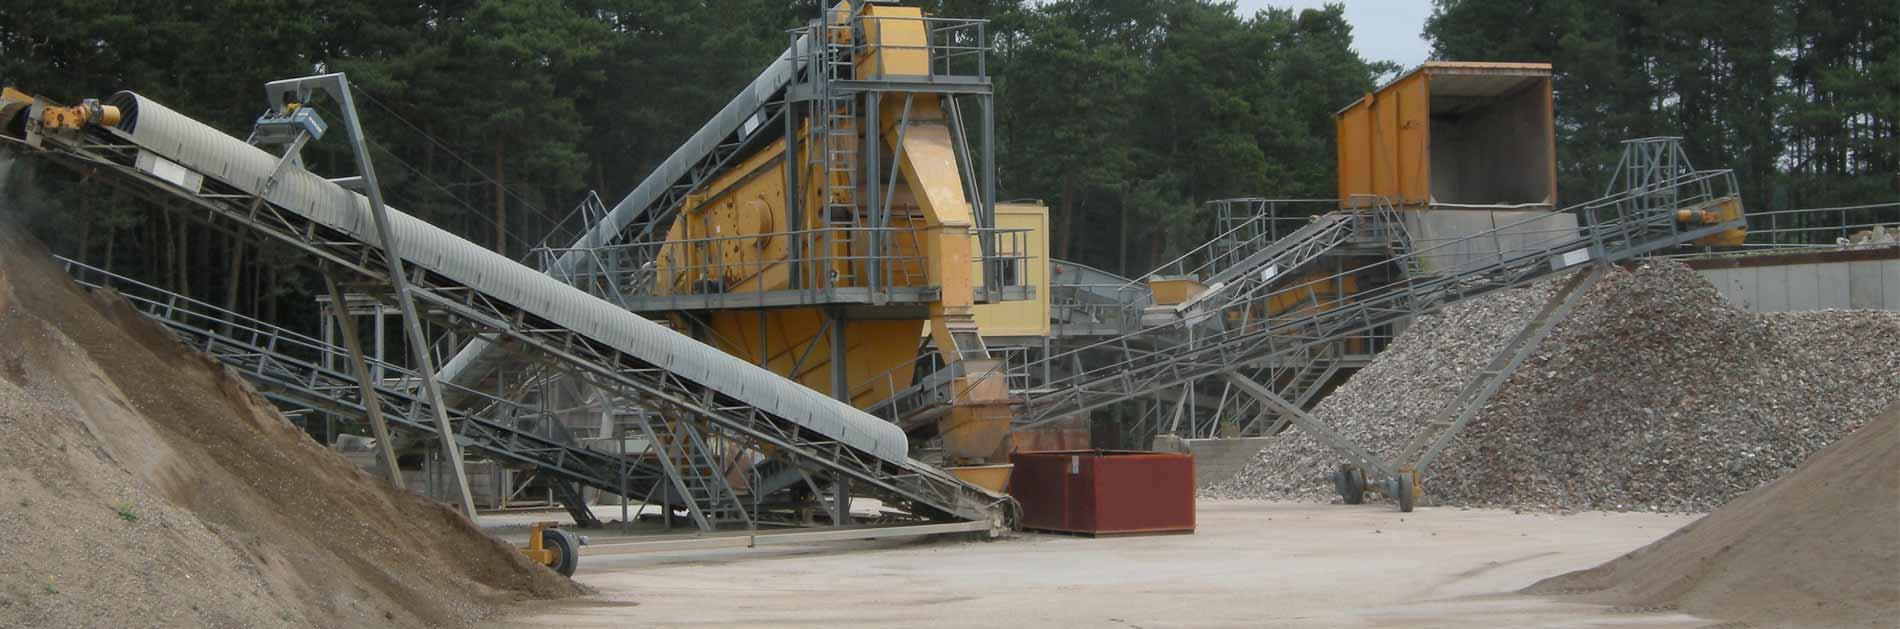 Mineralik Entsorgungsstätte